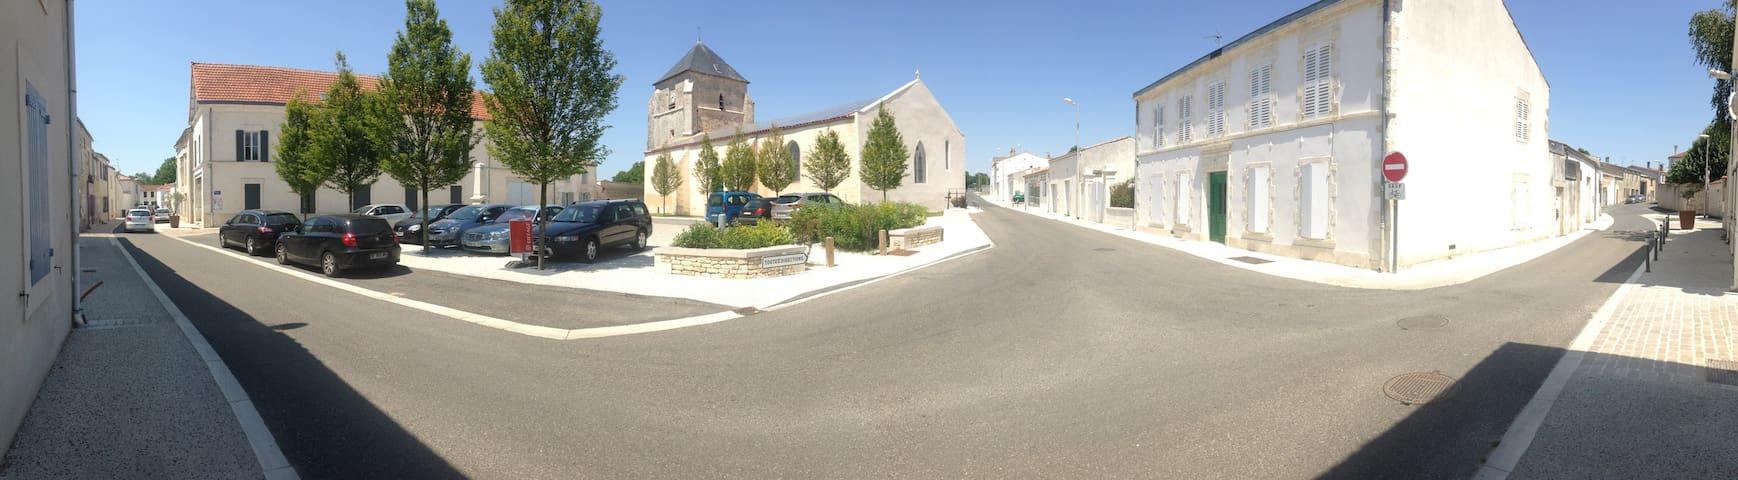 petit village plein de charme